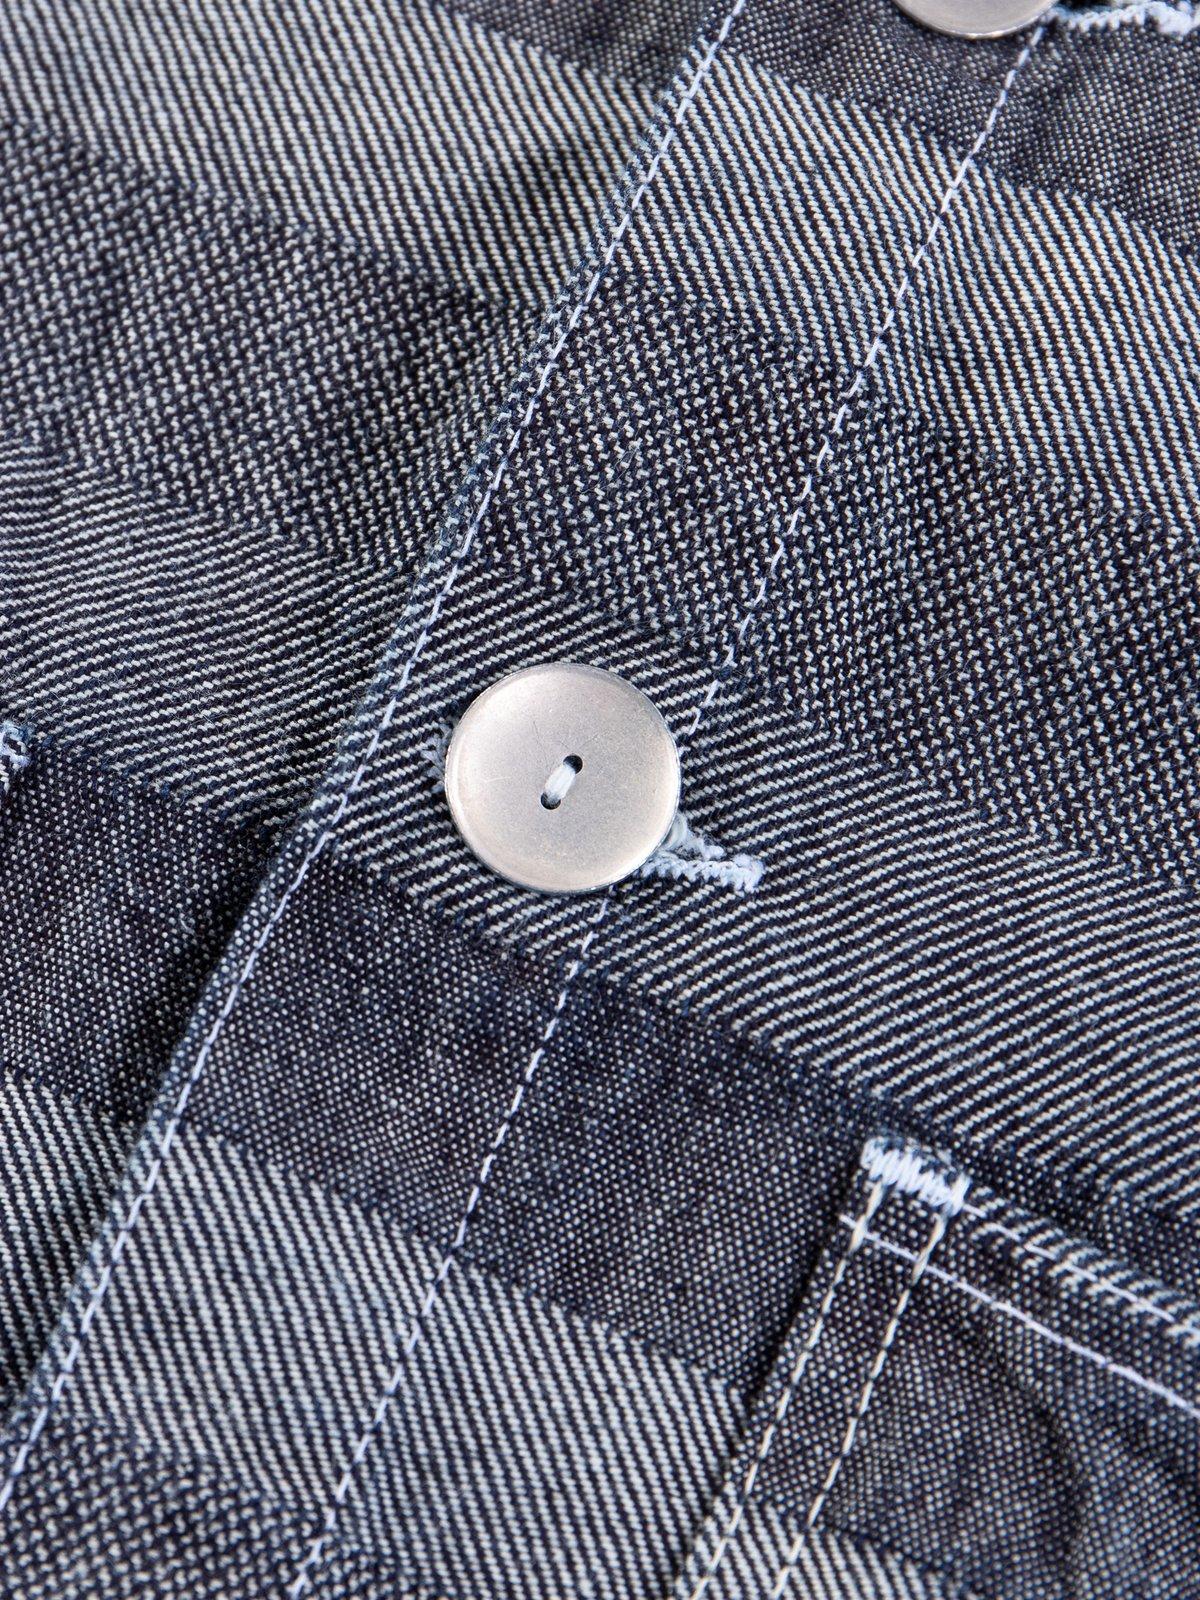 Rinse Washed Indigo Weaver's Blanket Stripe Floor Shirt - Image 6